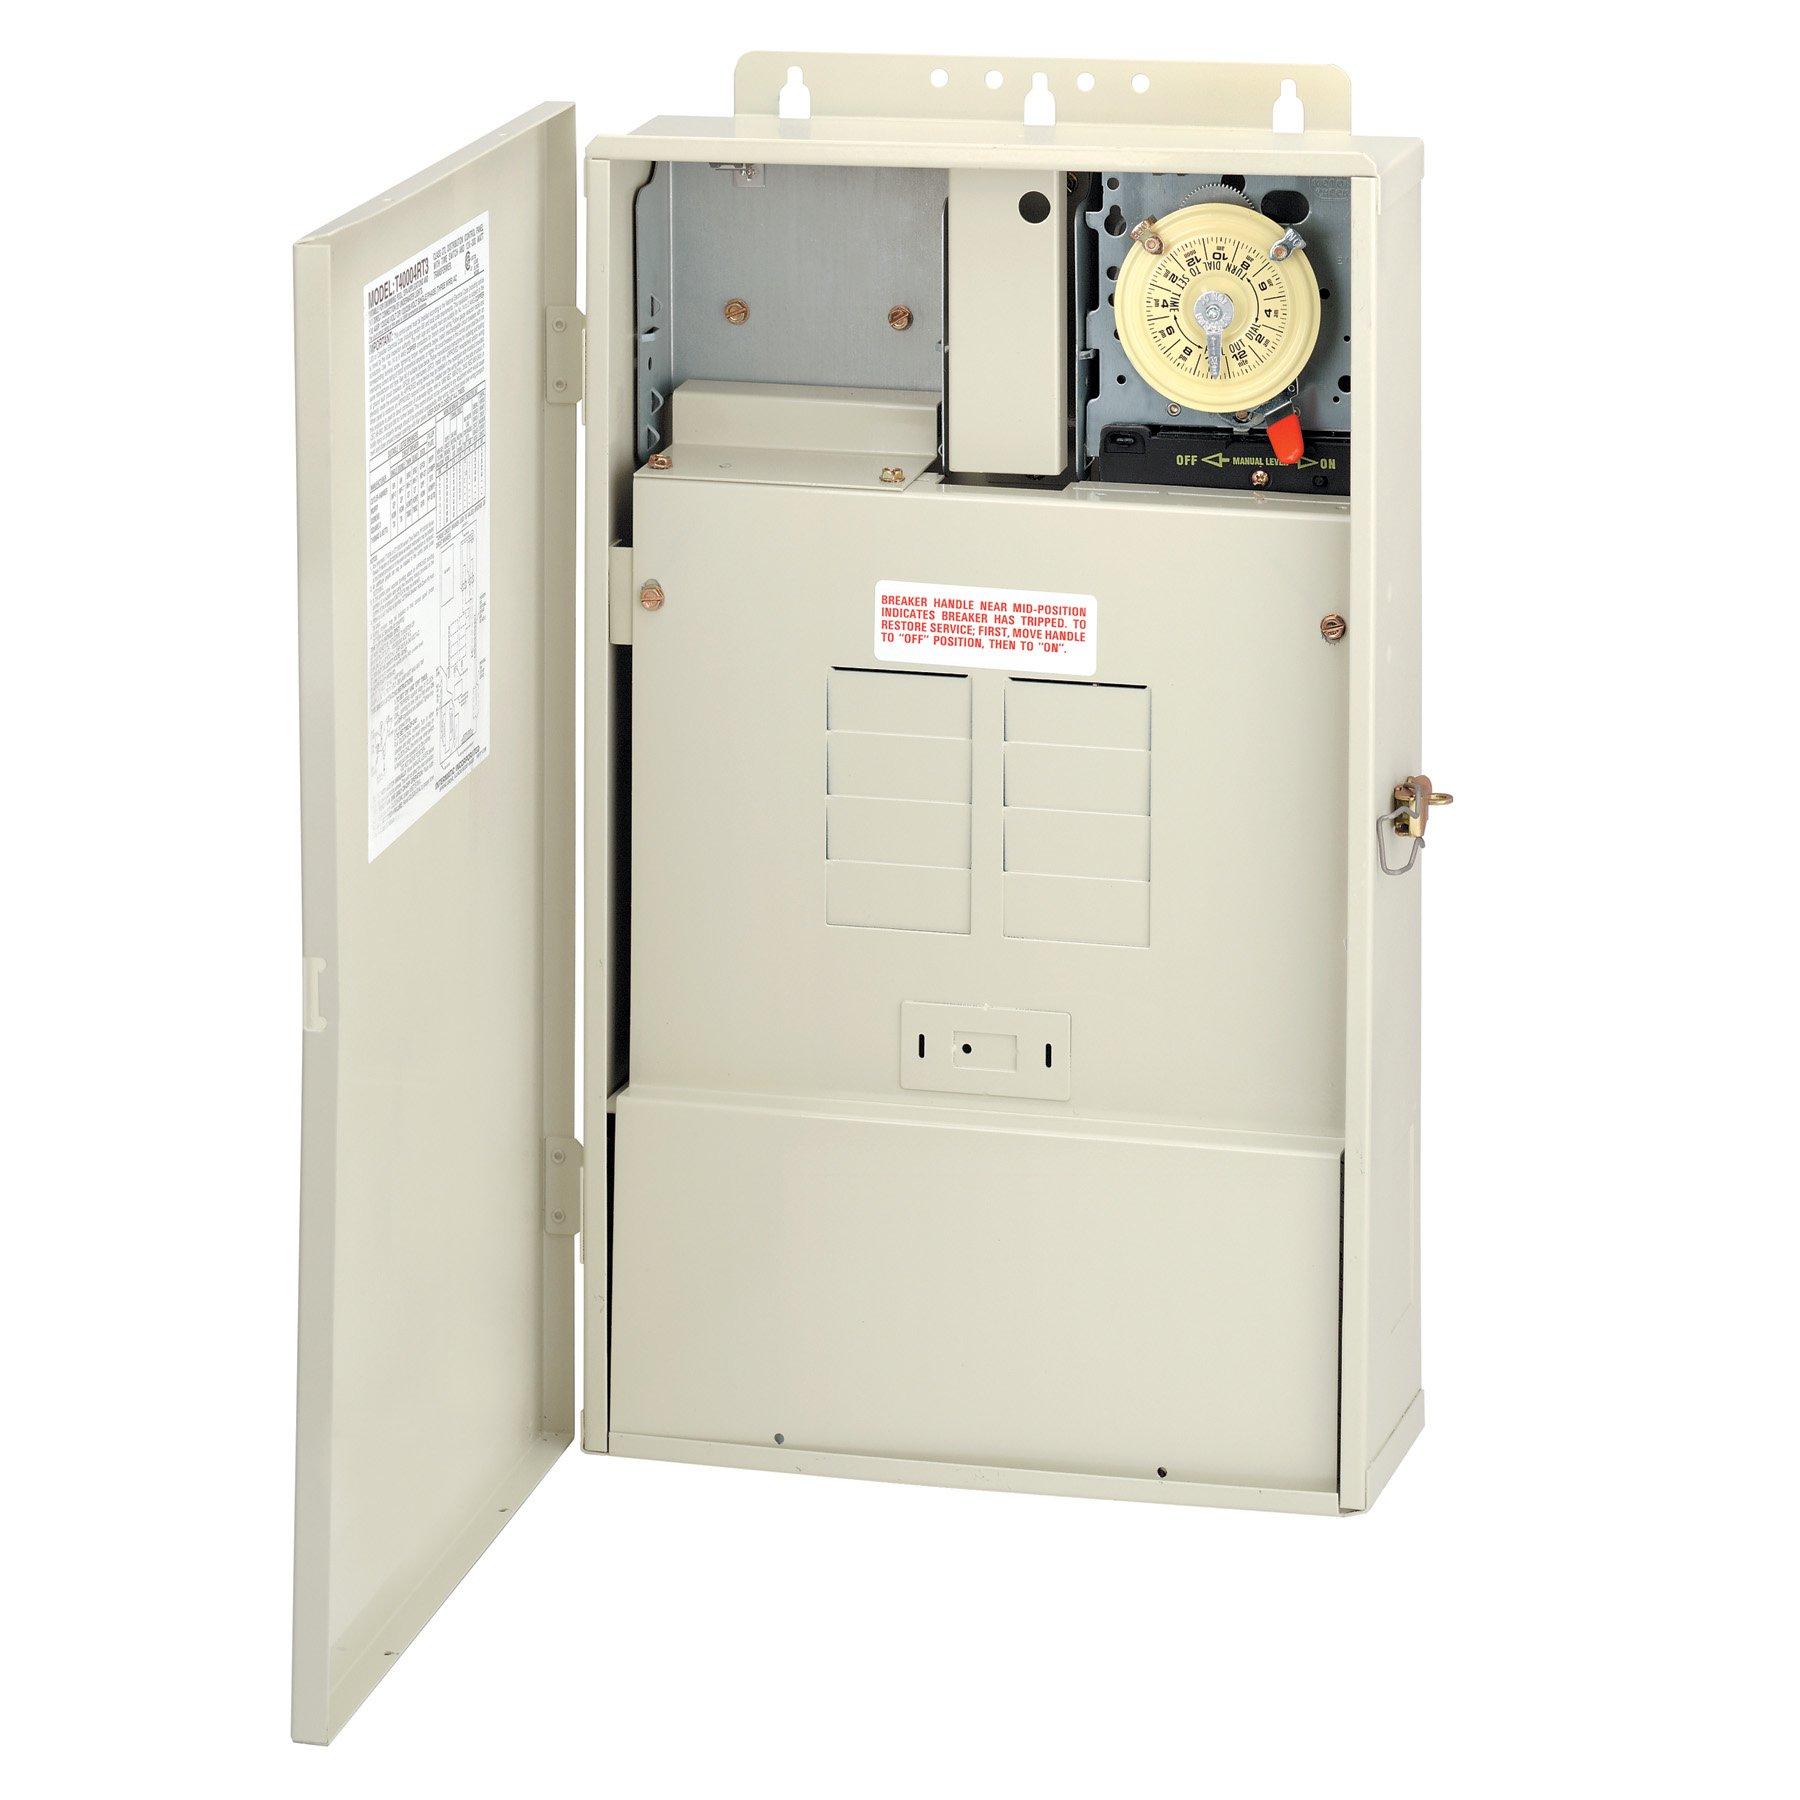 Intermatic T40003RT3 Pool Panel with Transformer 300-Watt